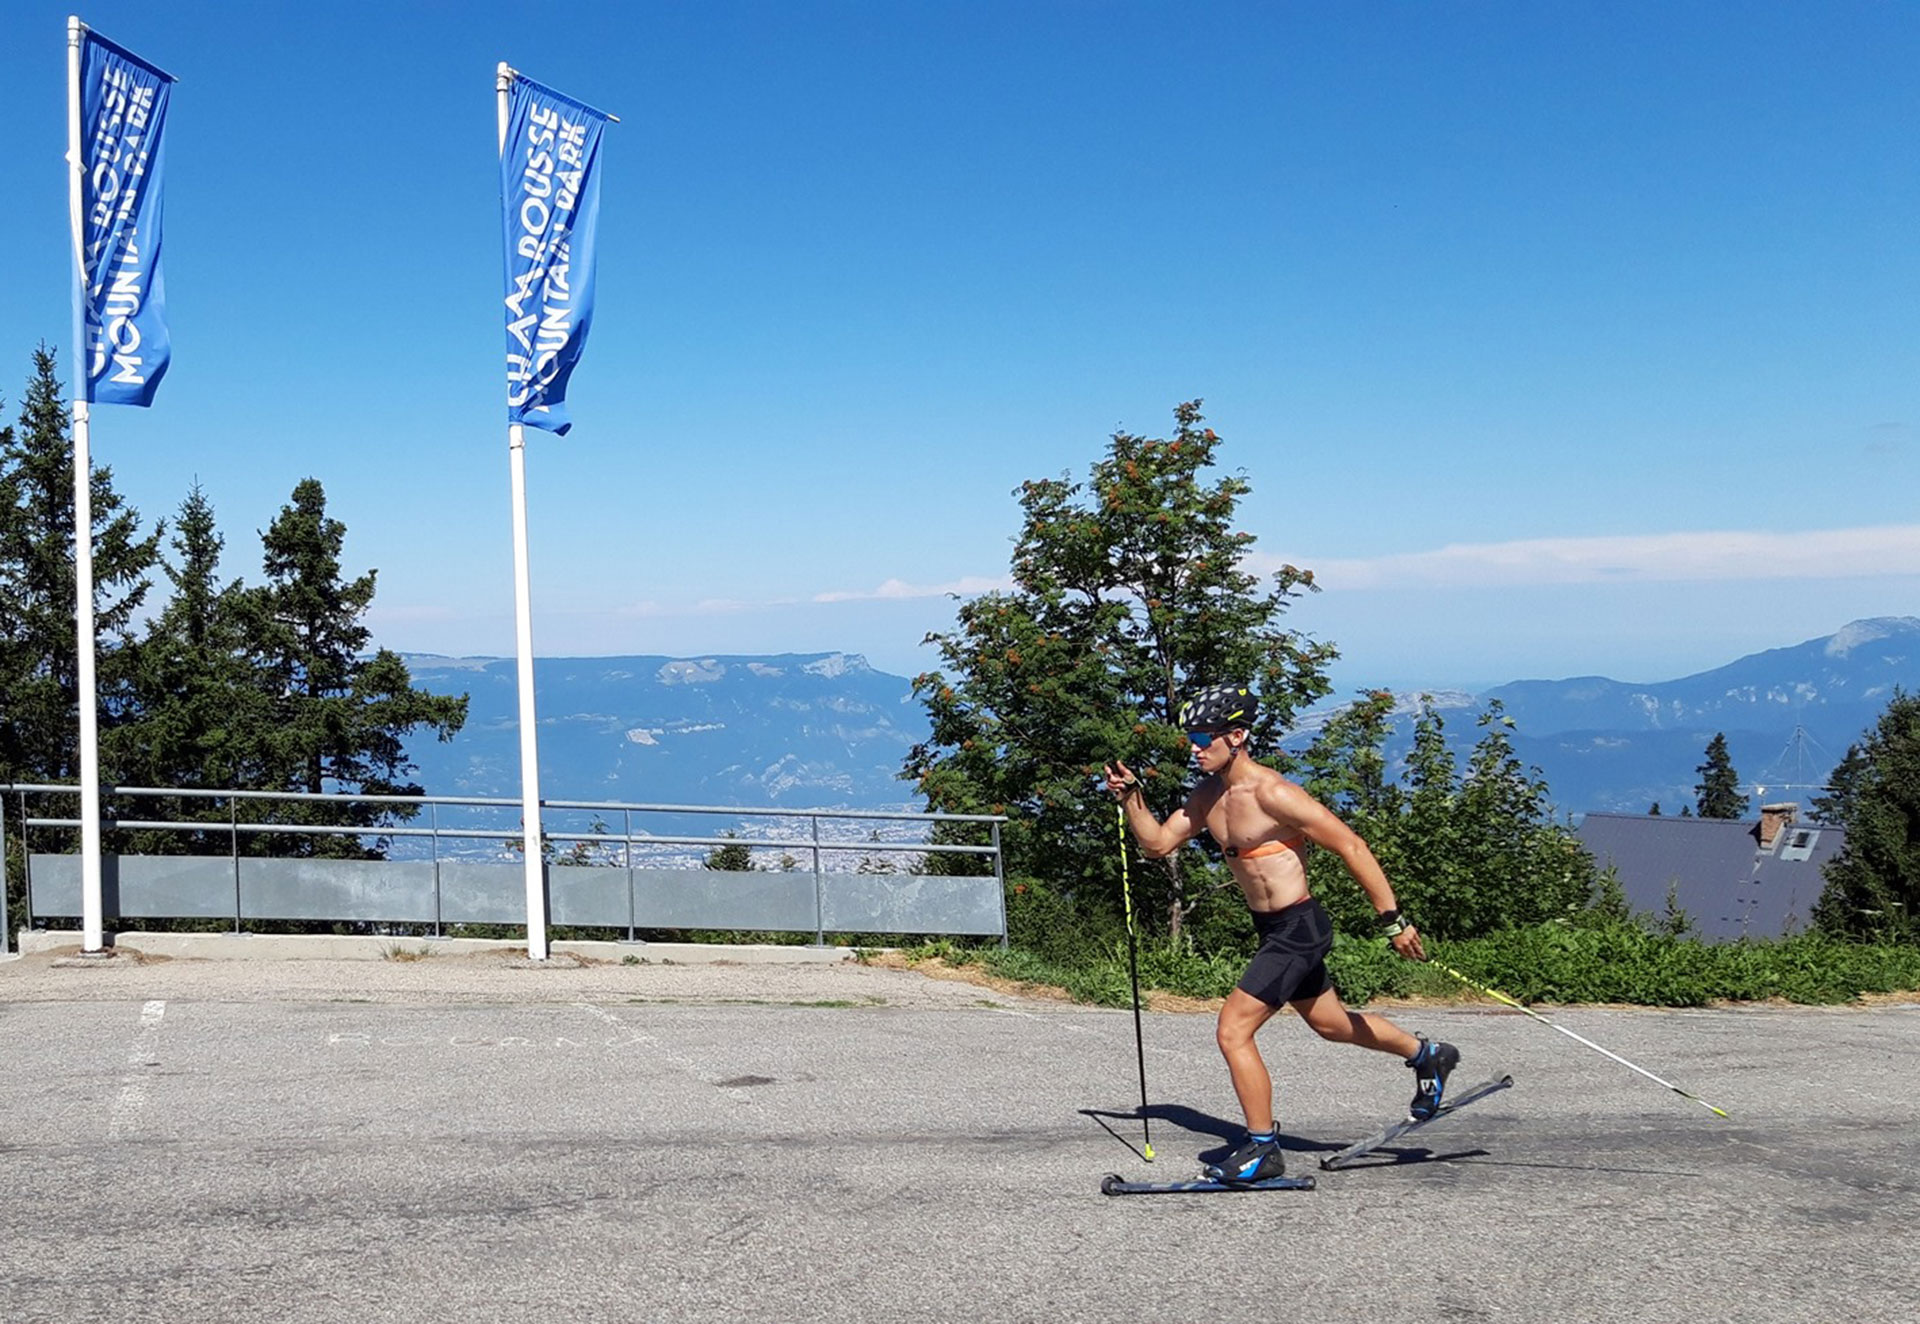 Chamrousse champion jérémy royer ski fond skating ski roue été snbc station montagne ski isère france - © Jérémy Royer